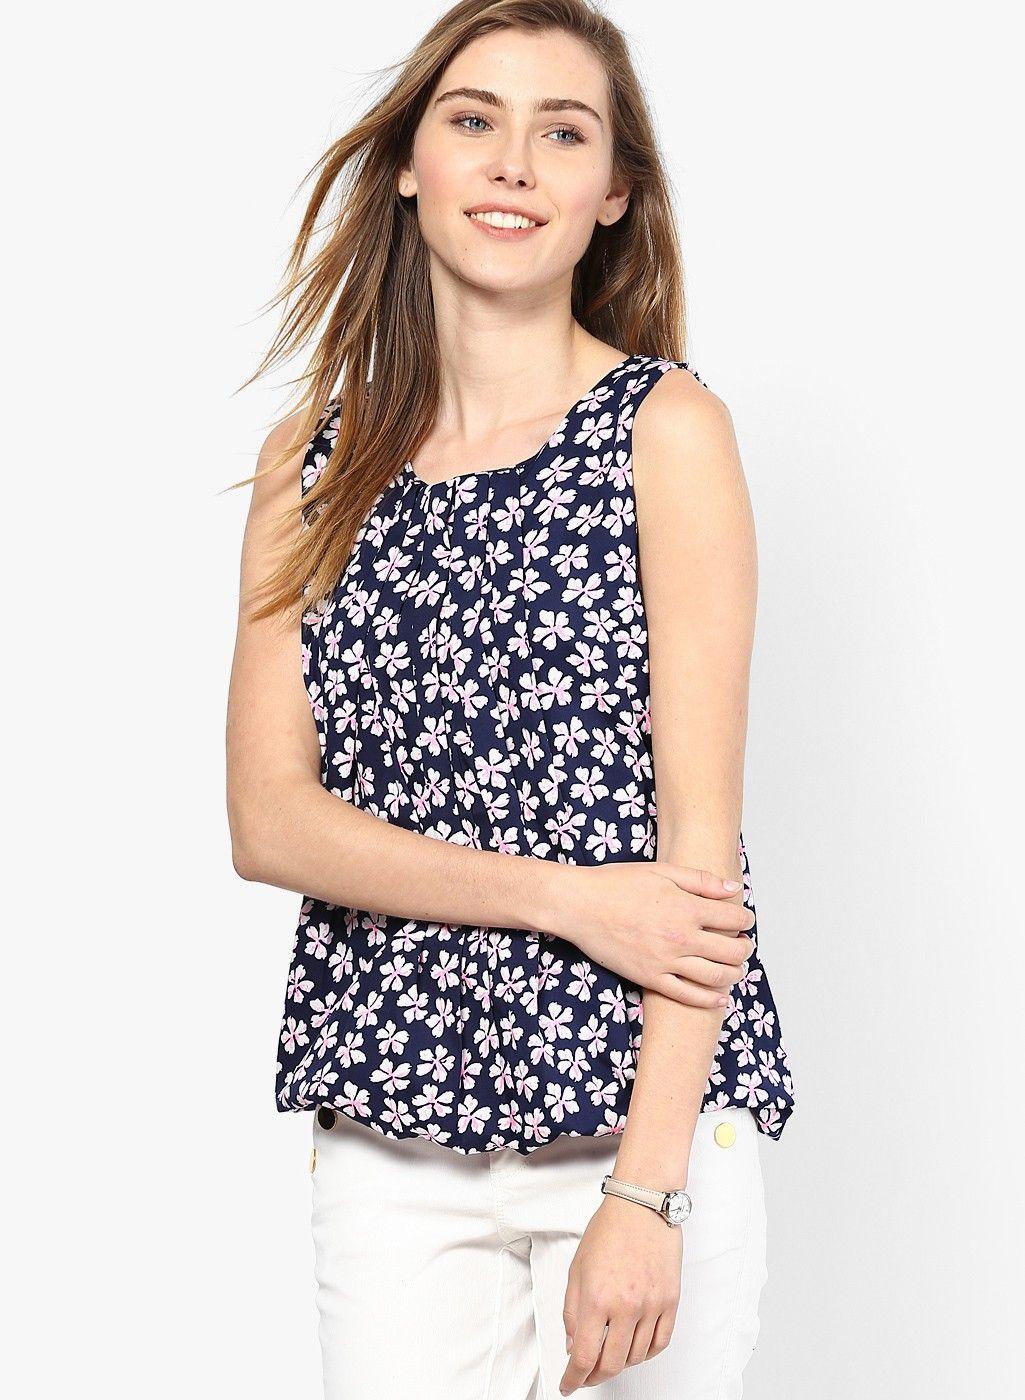 Pin On Women S Clothing Accessories Western Wear